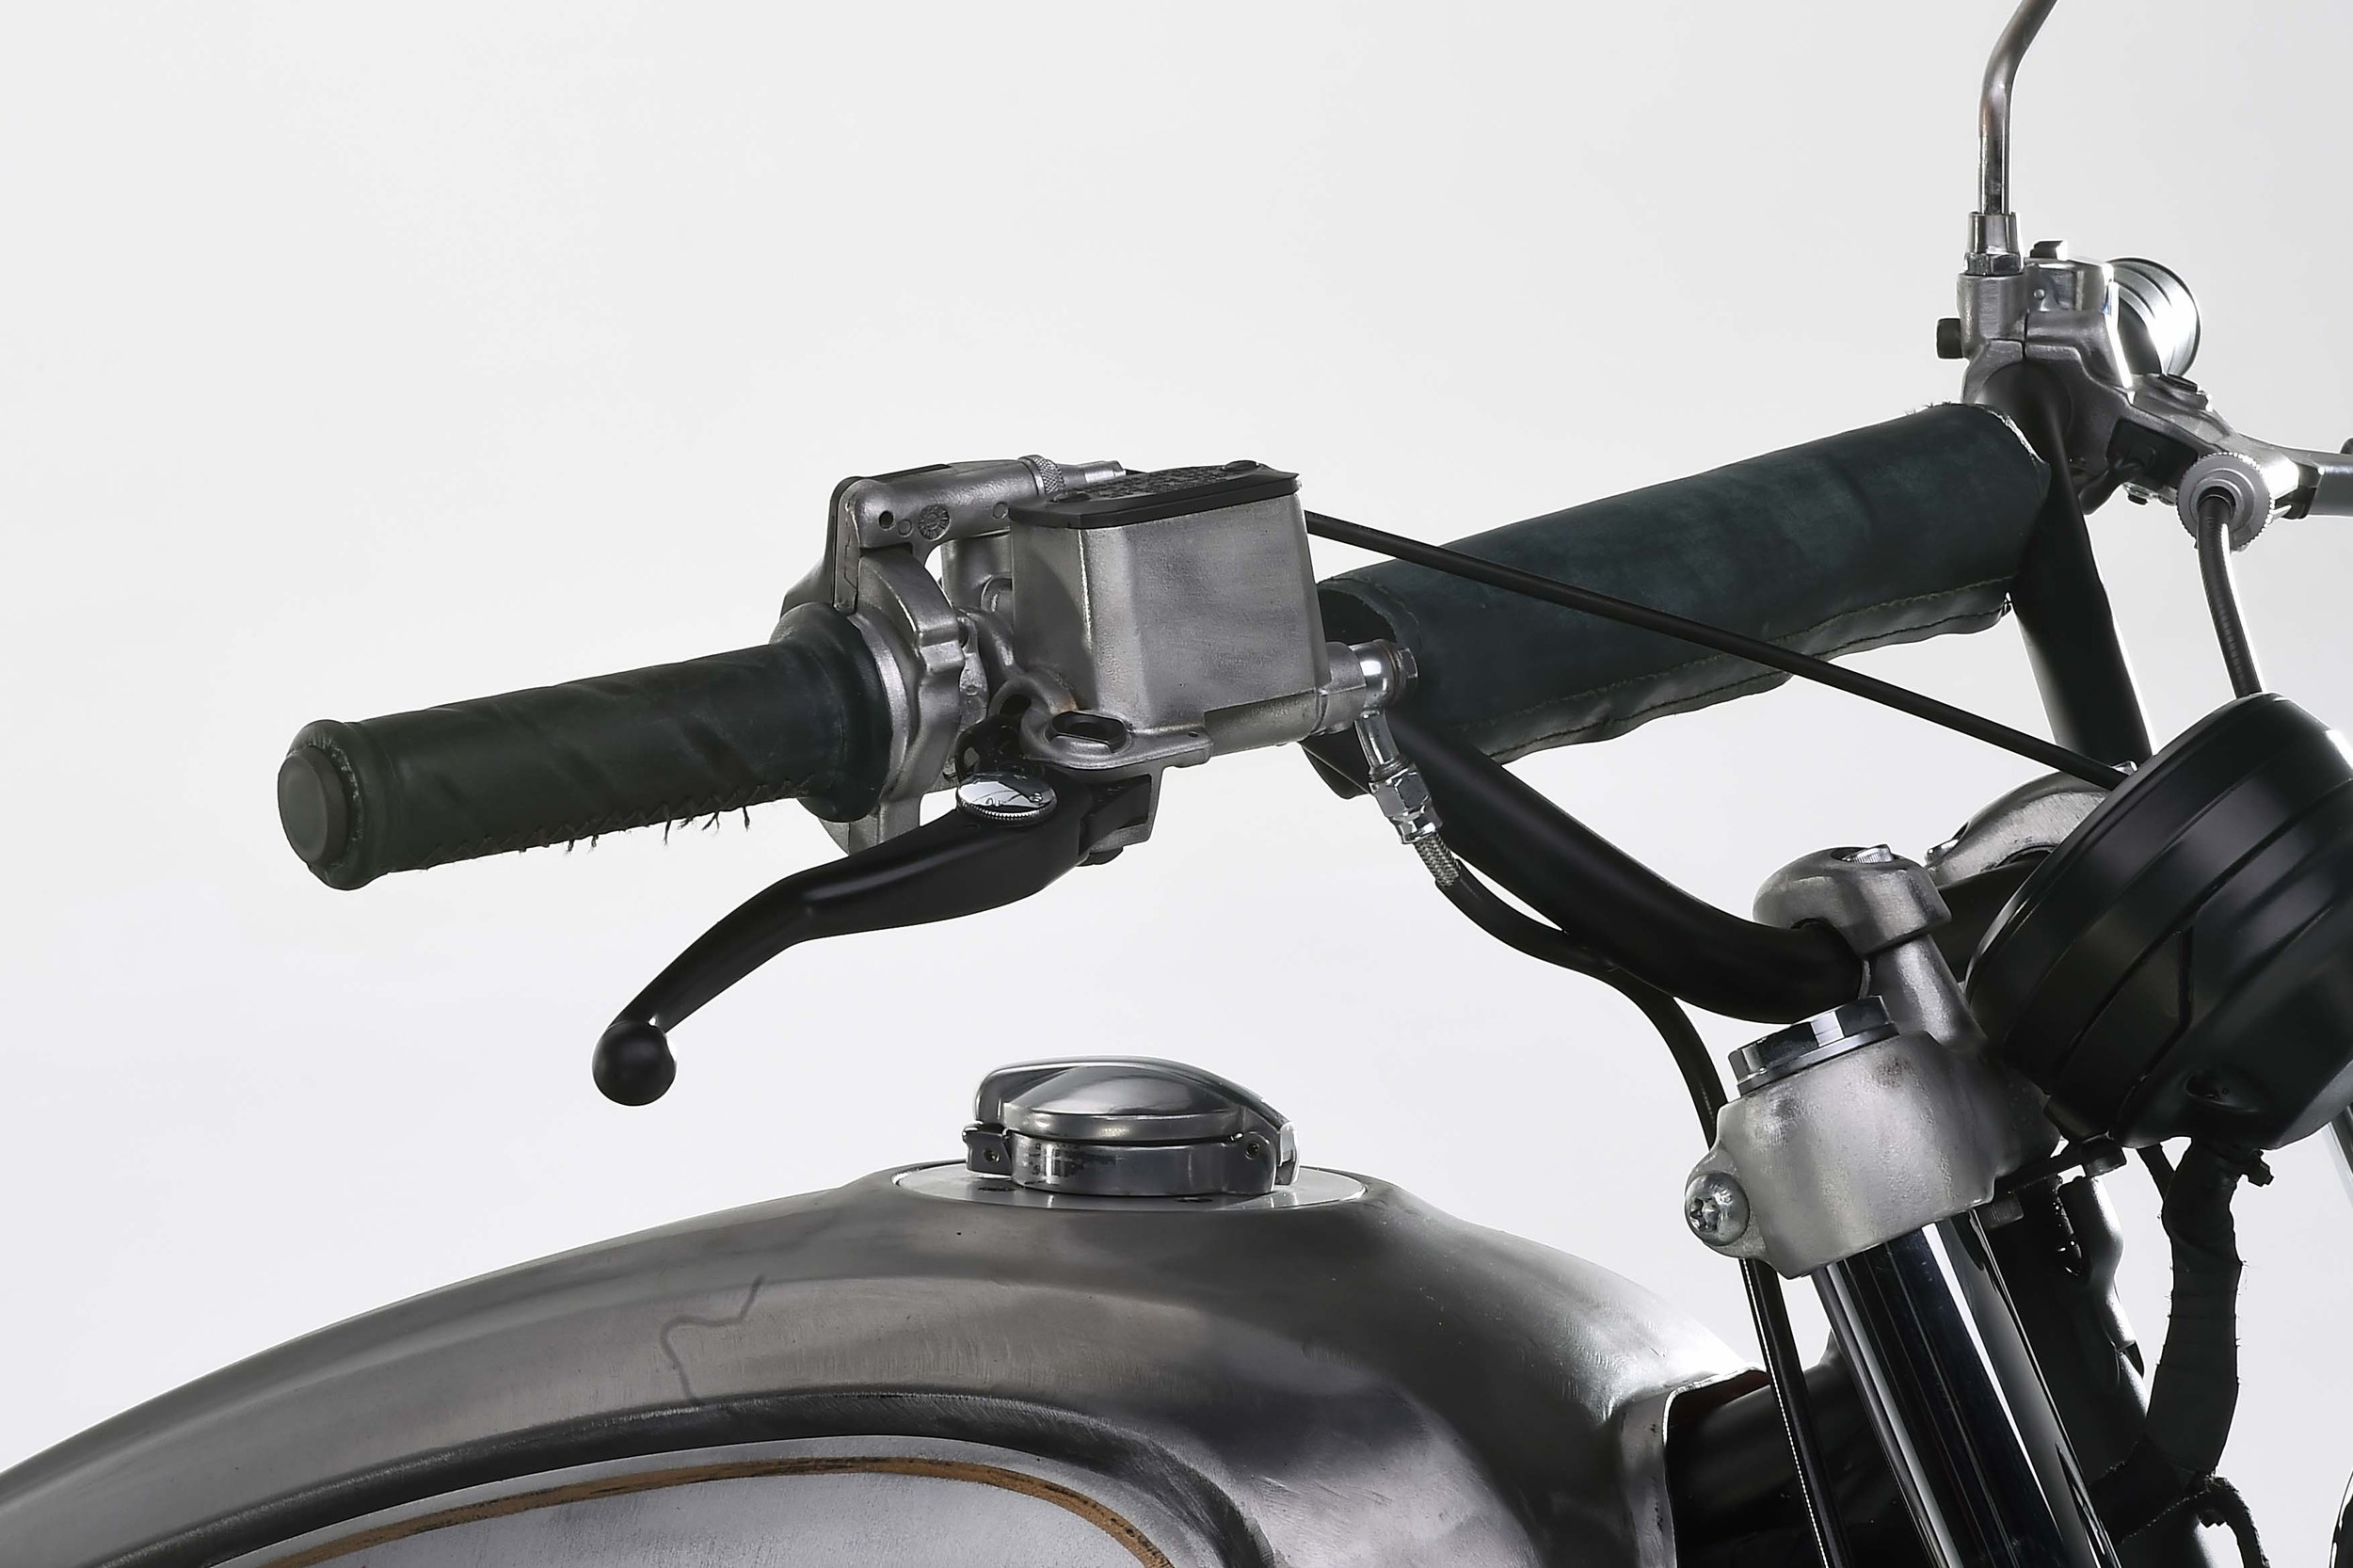 Ducati-Scrambler-Scratch-Concept-Officine-Mermaid-Dario-Mastroianni-03.jpg